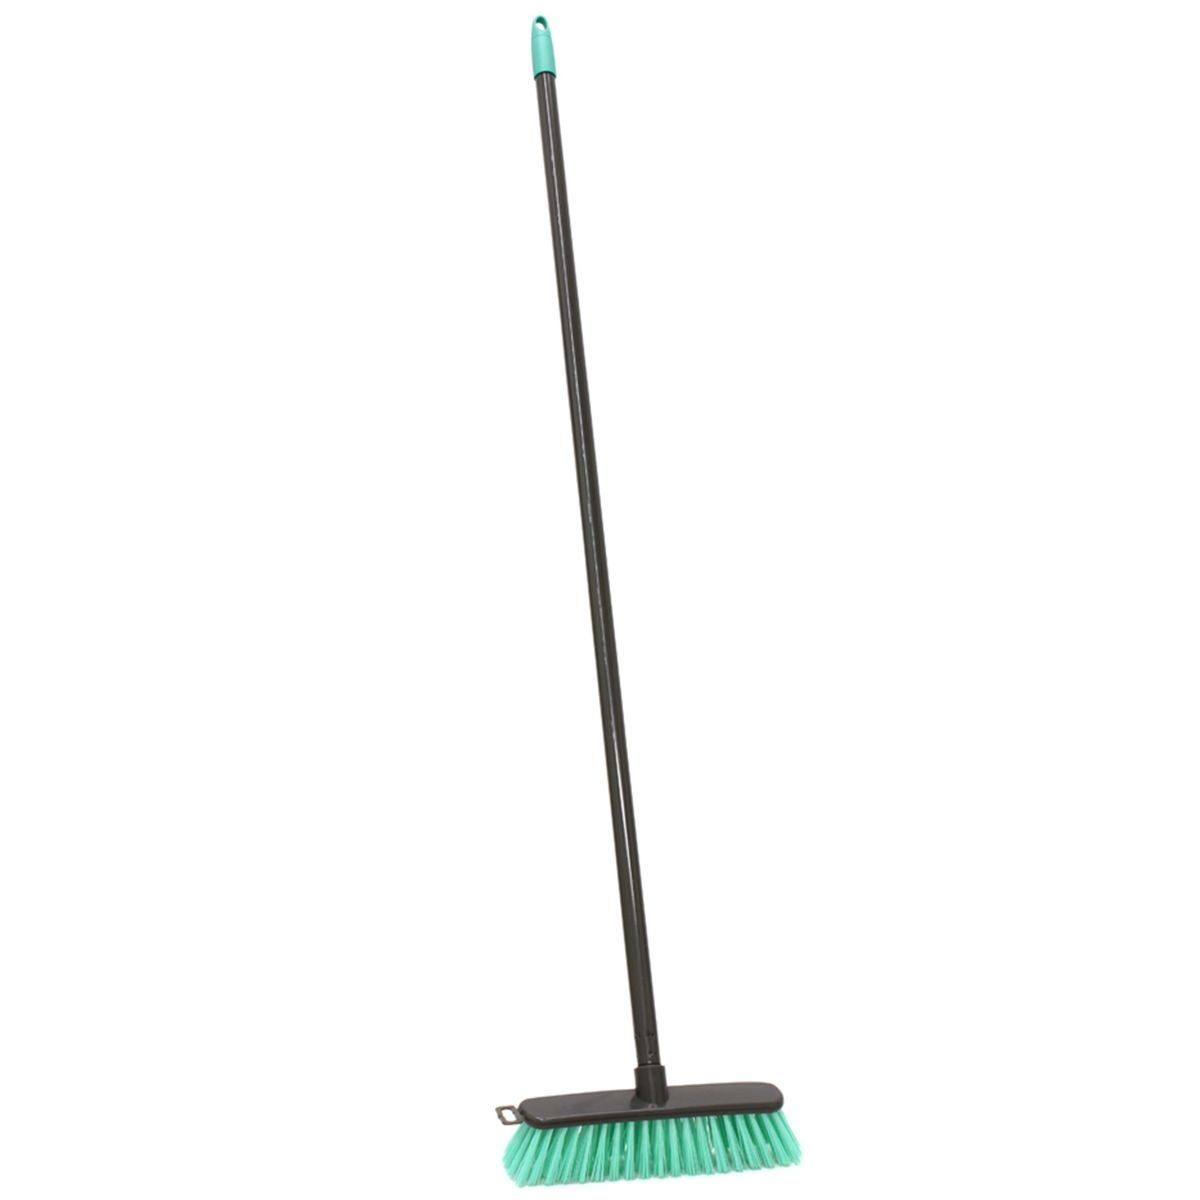 JVL Lightweight Outdoor Hard Bristle Sweeping Brush Broom Turquoise/Grey